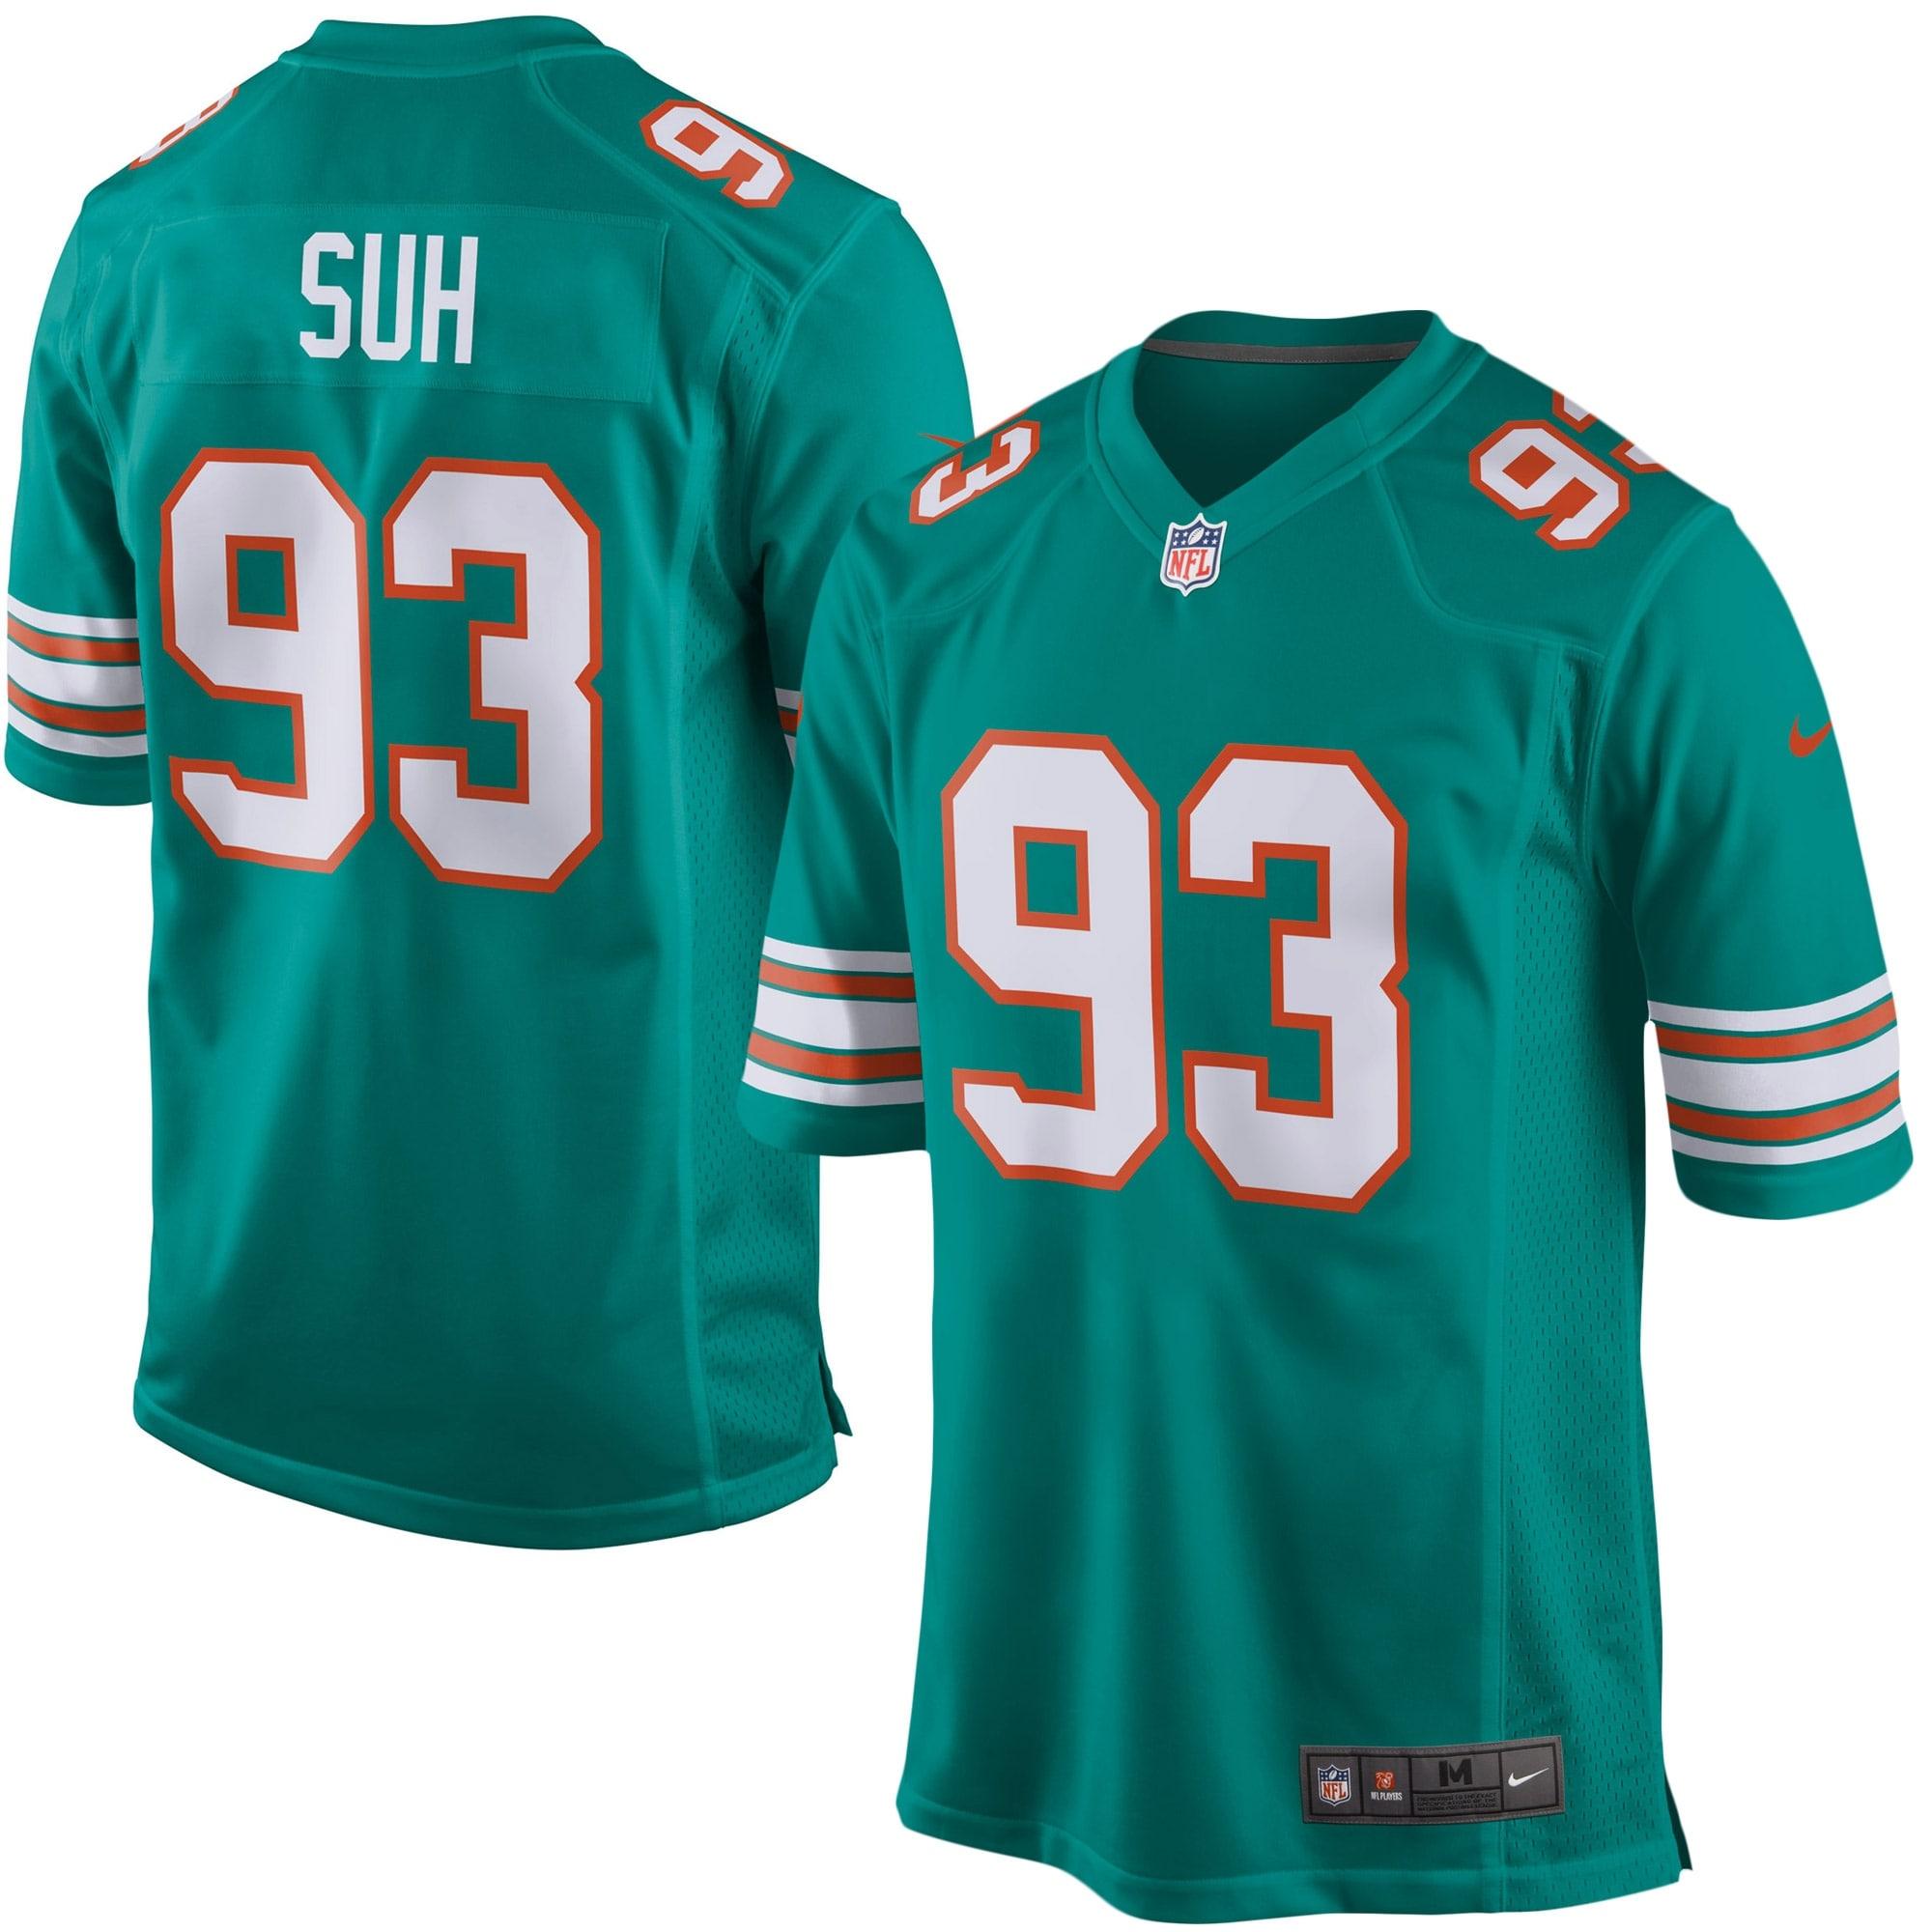 Ndamukong Suh Miami Dolphins Nike Alternate Game Jersey - Aqua